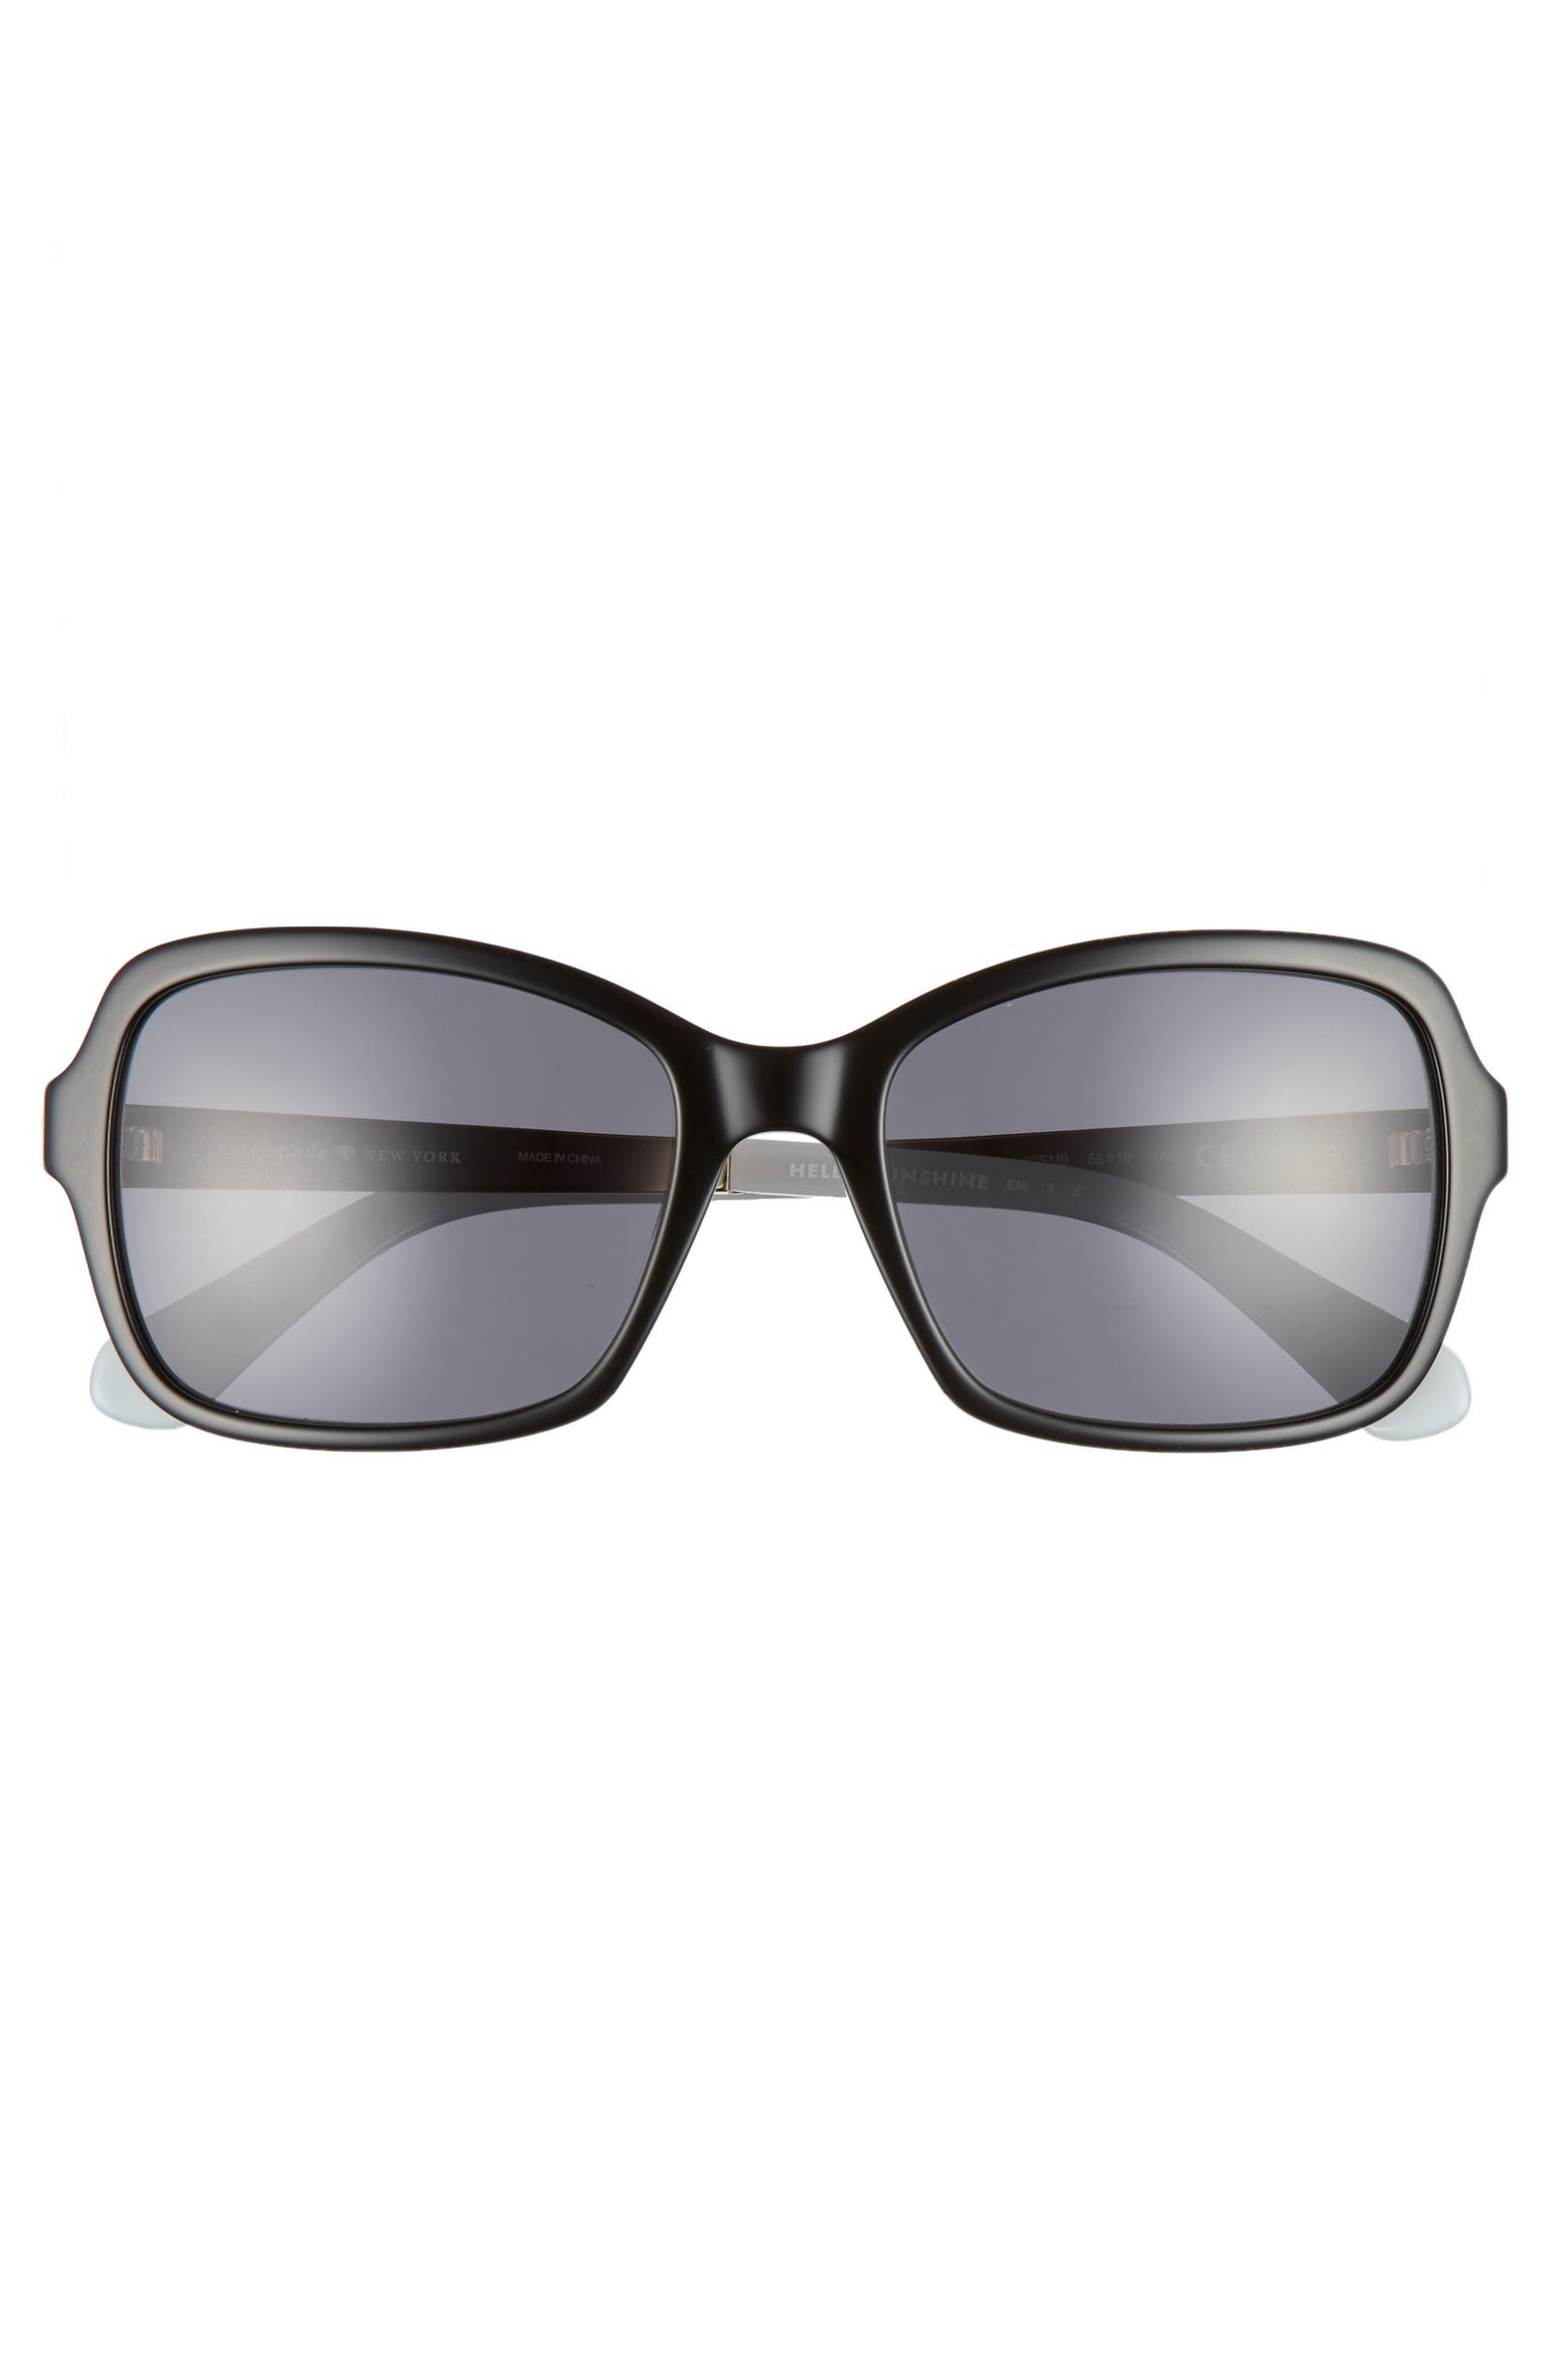 c3ae70ada8 kate spade new york annjanette 55mm polarized sunglasses